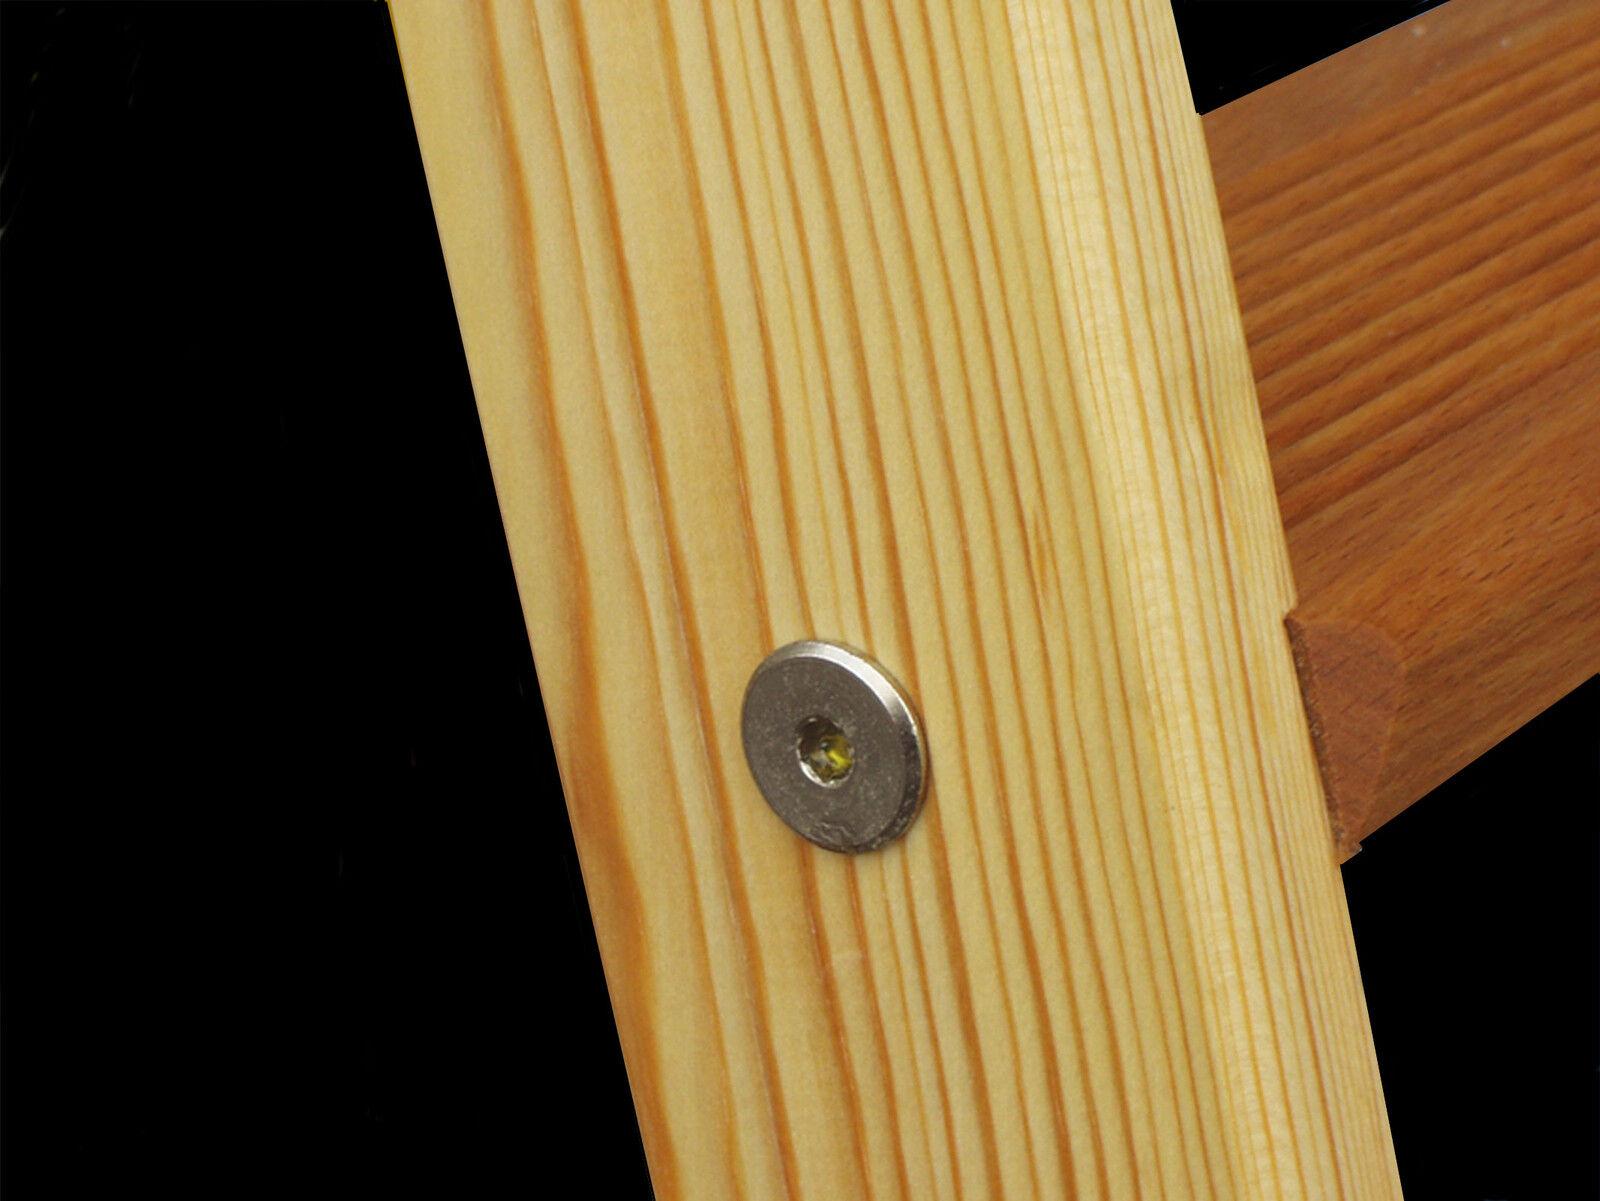 hochbettleiter regalleiter holz 9 stufen f r senkr h he von 2 12 m eur 103 99 picclick de. Black Bedroom Furniture Sets. Home Design Ideas